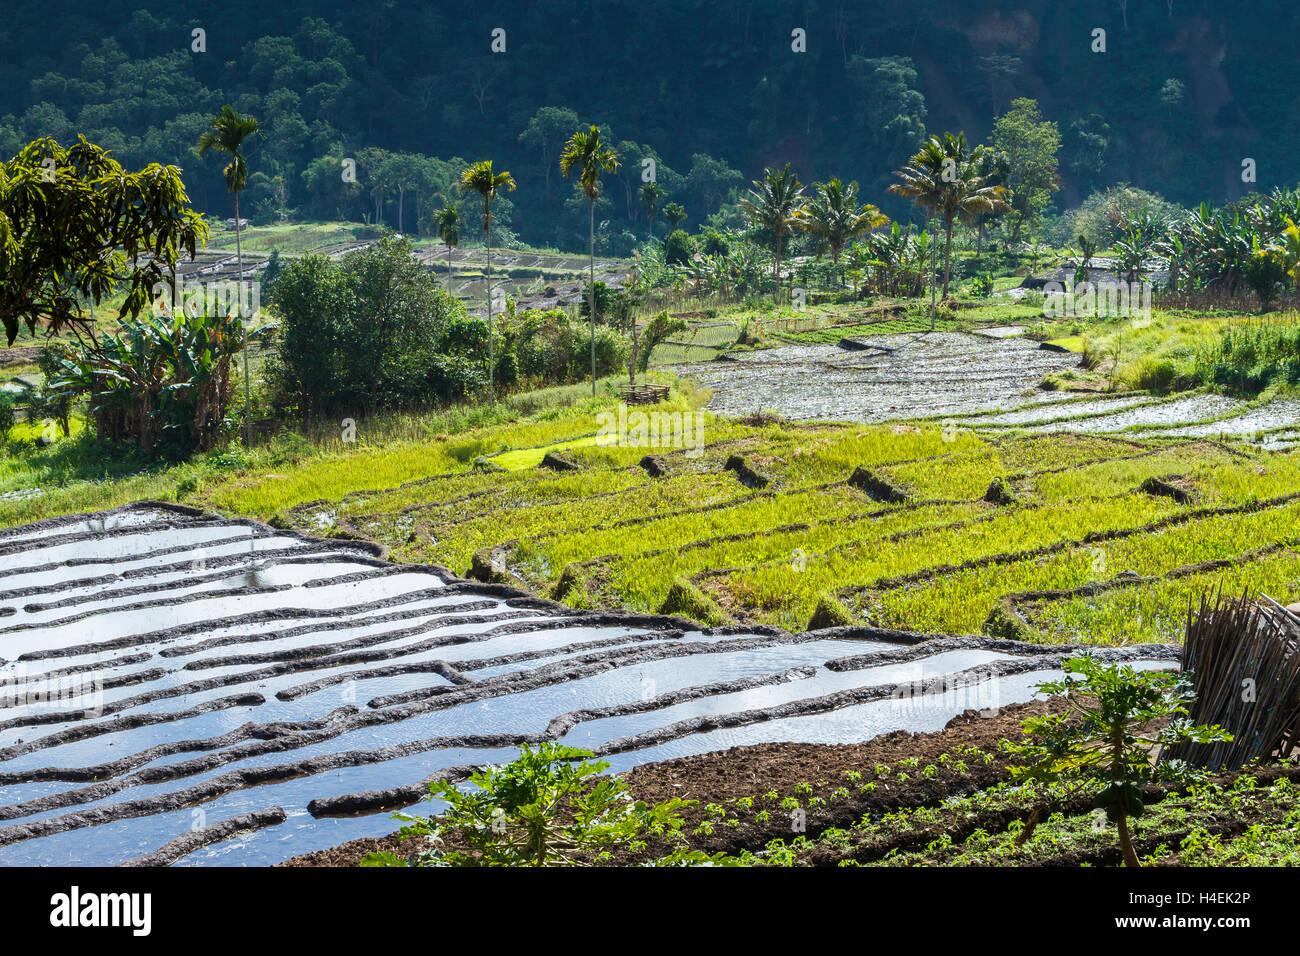 Rice terraces. - Stock Image